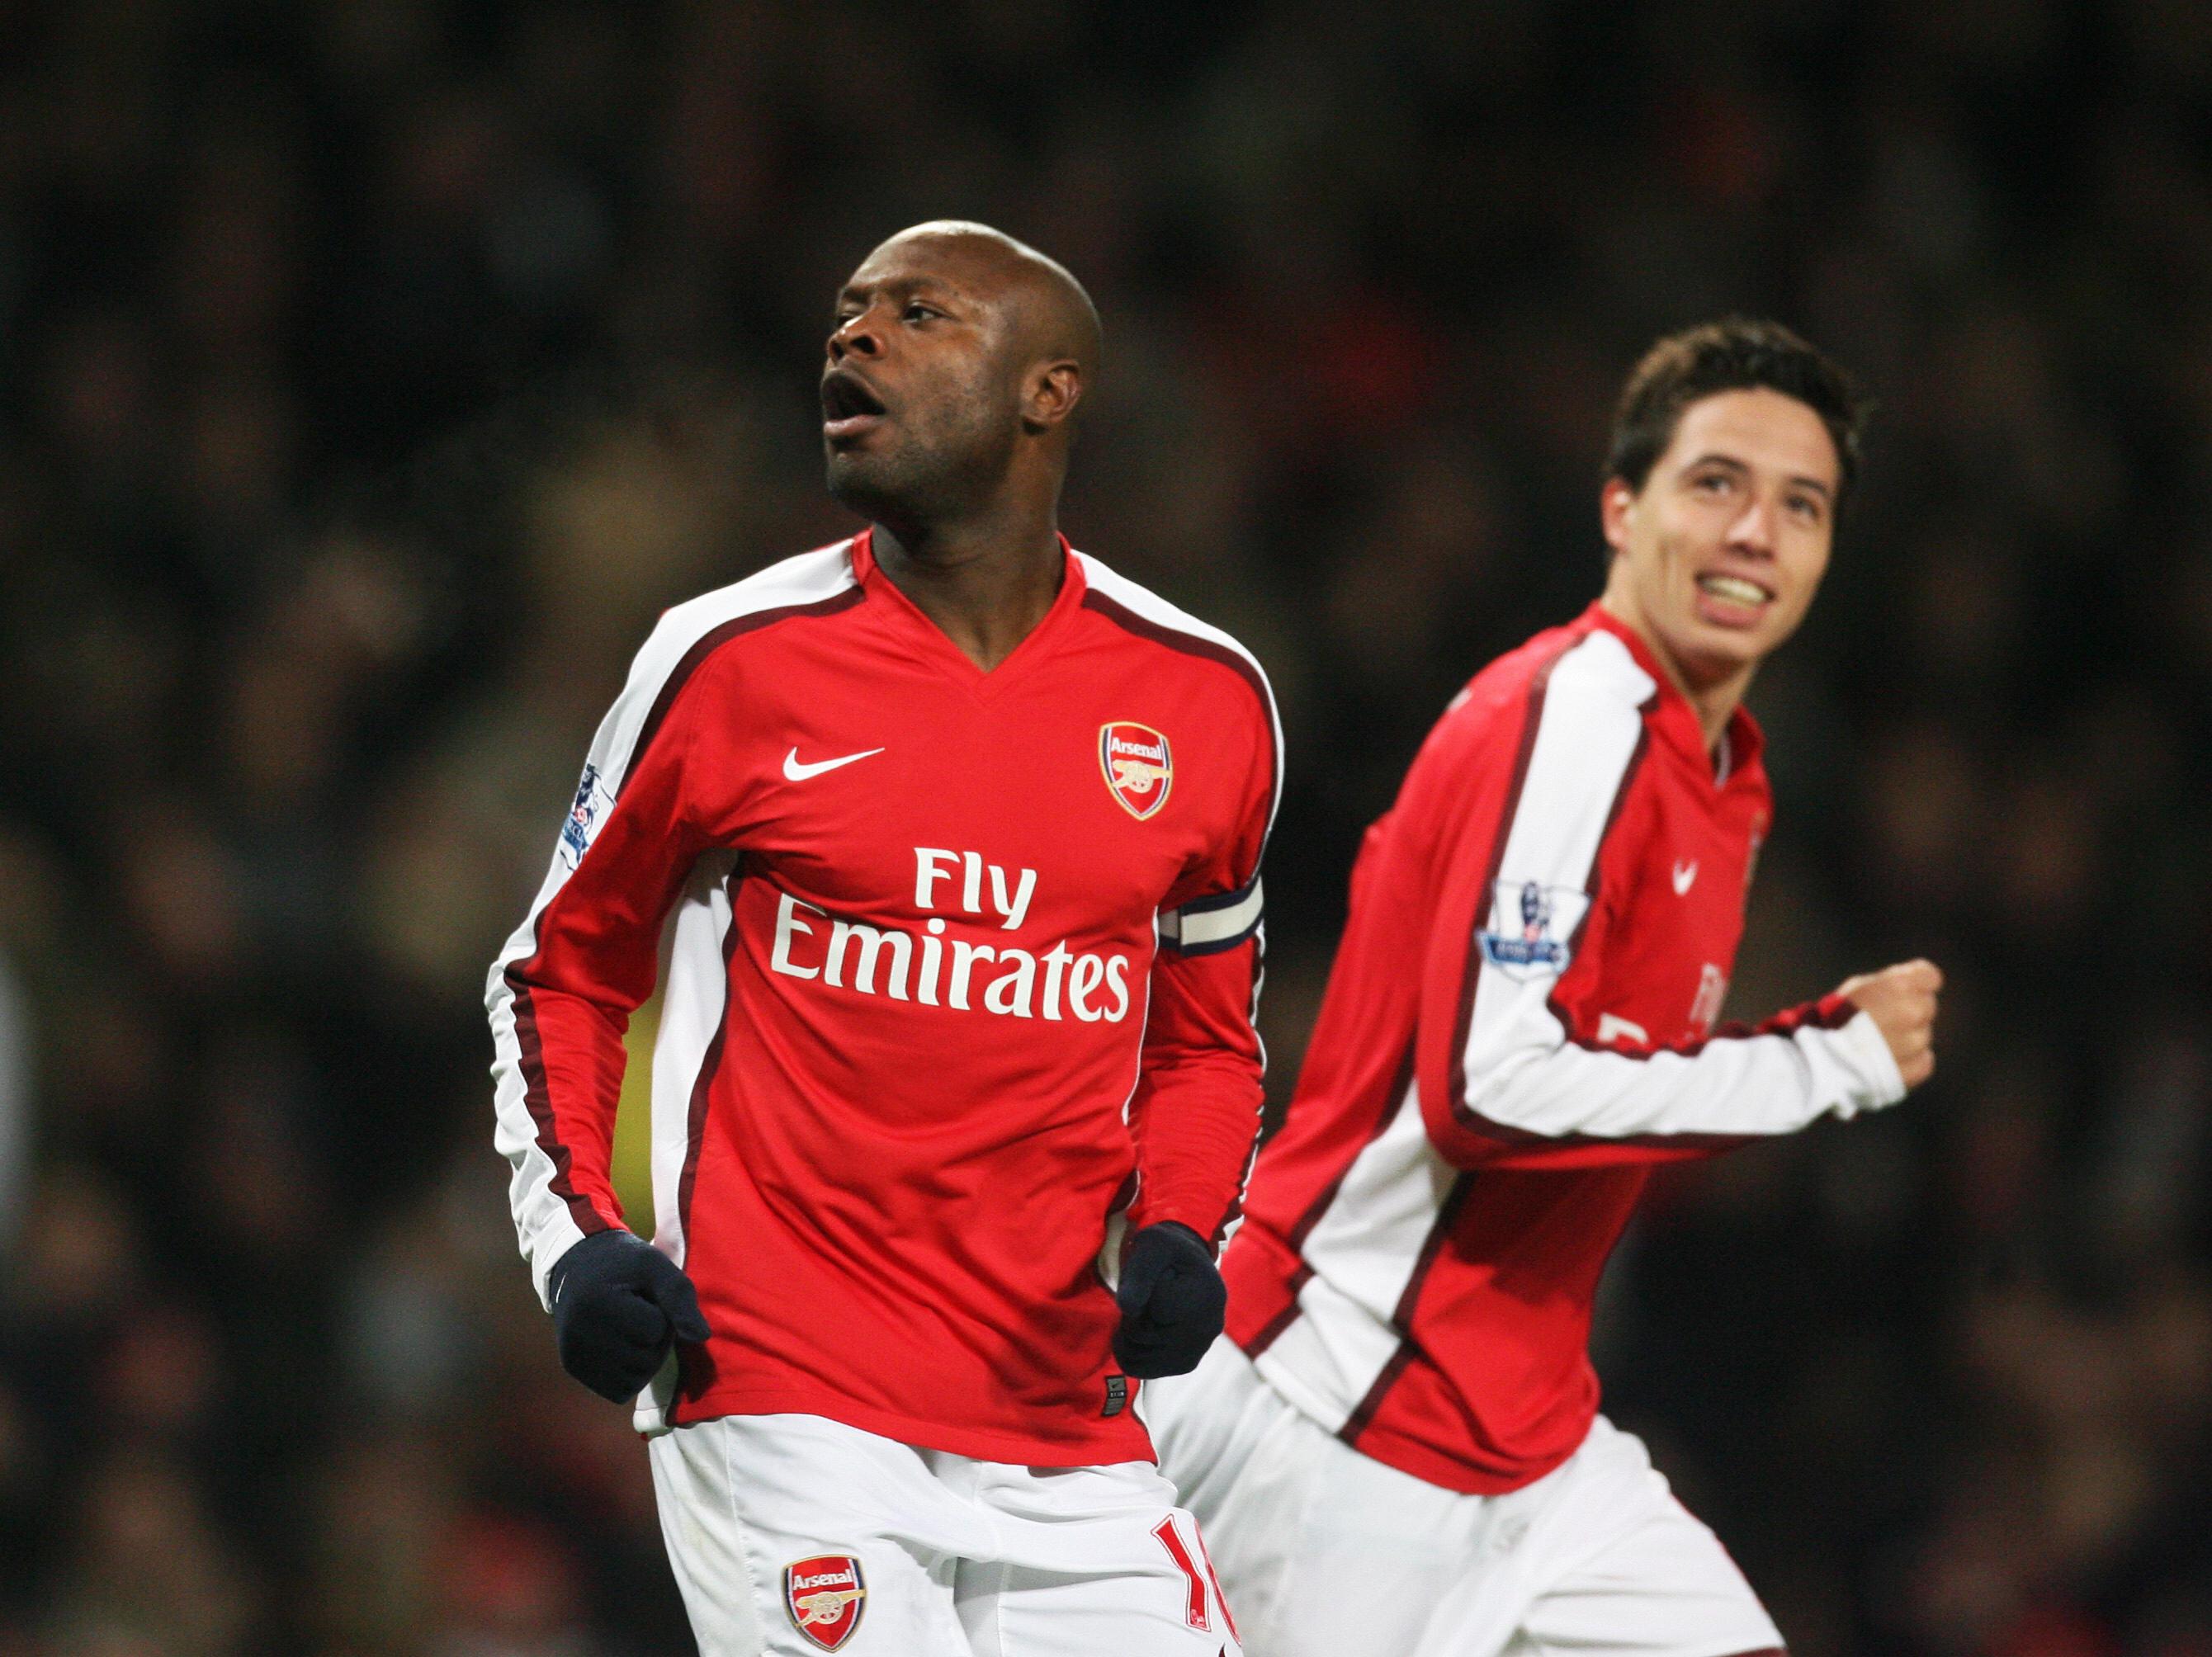 Former Arsenal defender William Gallas once feared teammate Samir Nasri planned to have him tasered